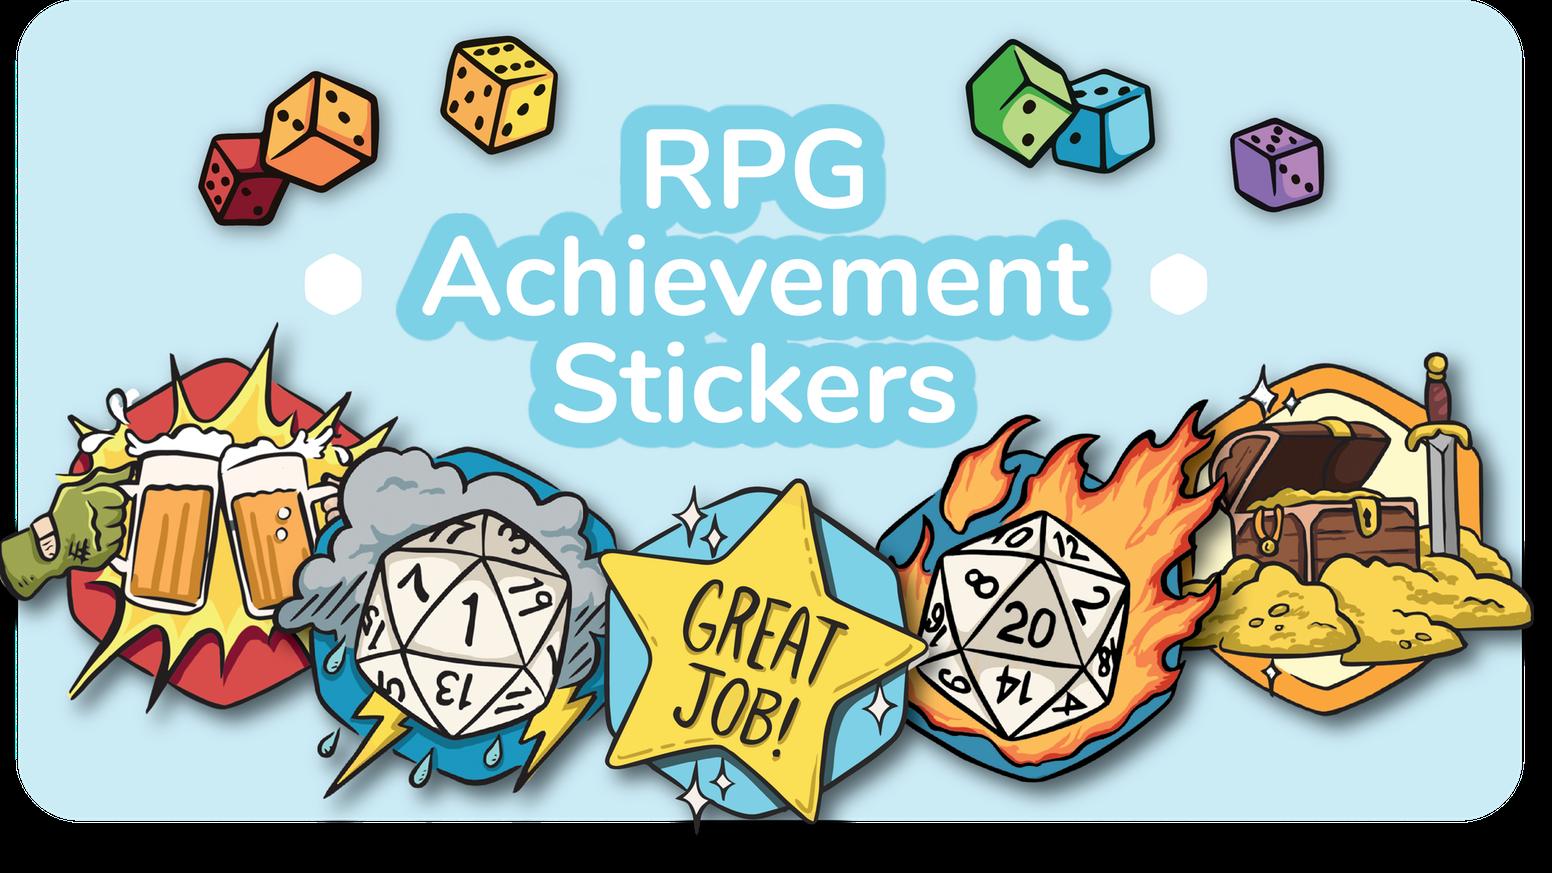 Tabletop rpg clipart freeuse stock RPG Achievement Stickers by Bearowl Studios — Kickstarter freeuse stock